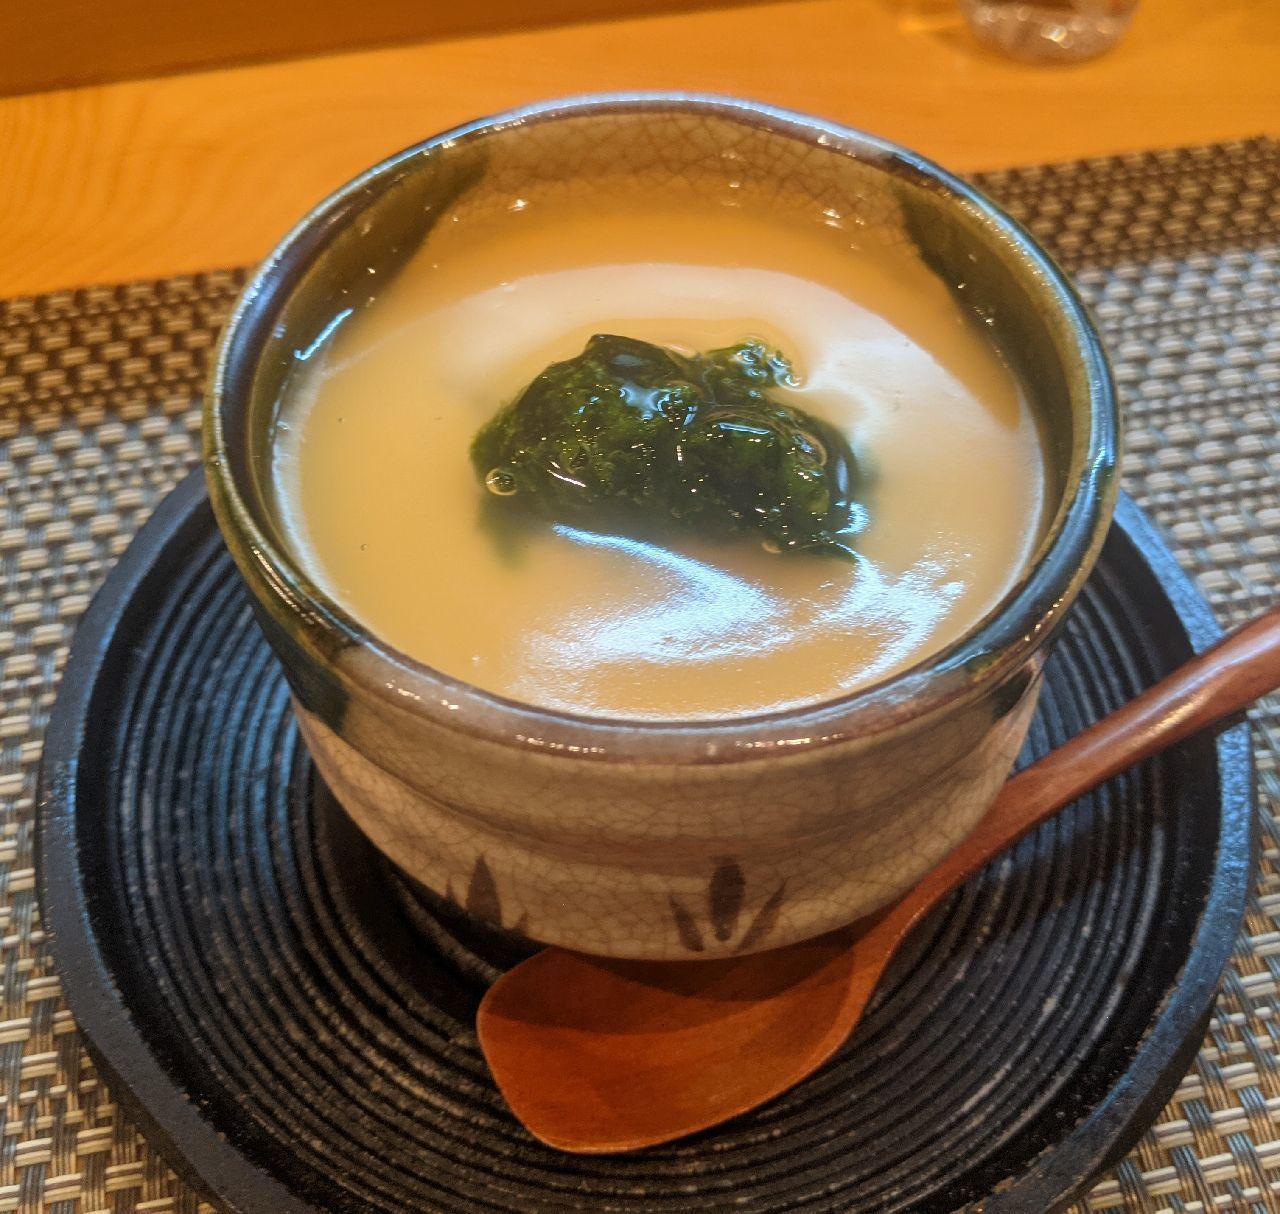 PXL_20210721_100929799河豚の白子茶碗蒸し